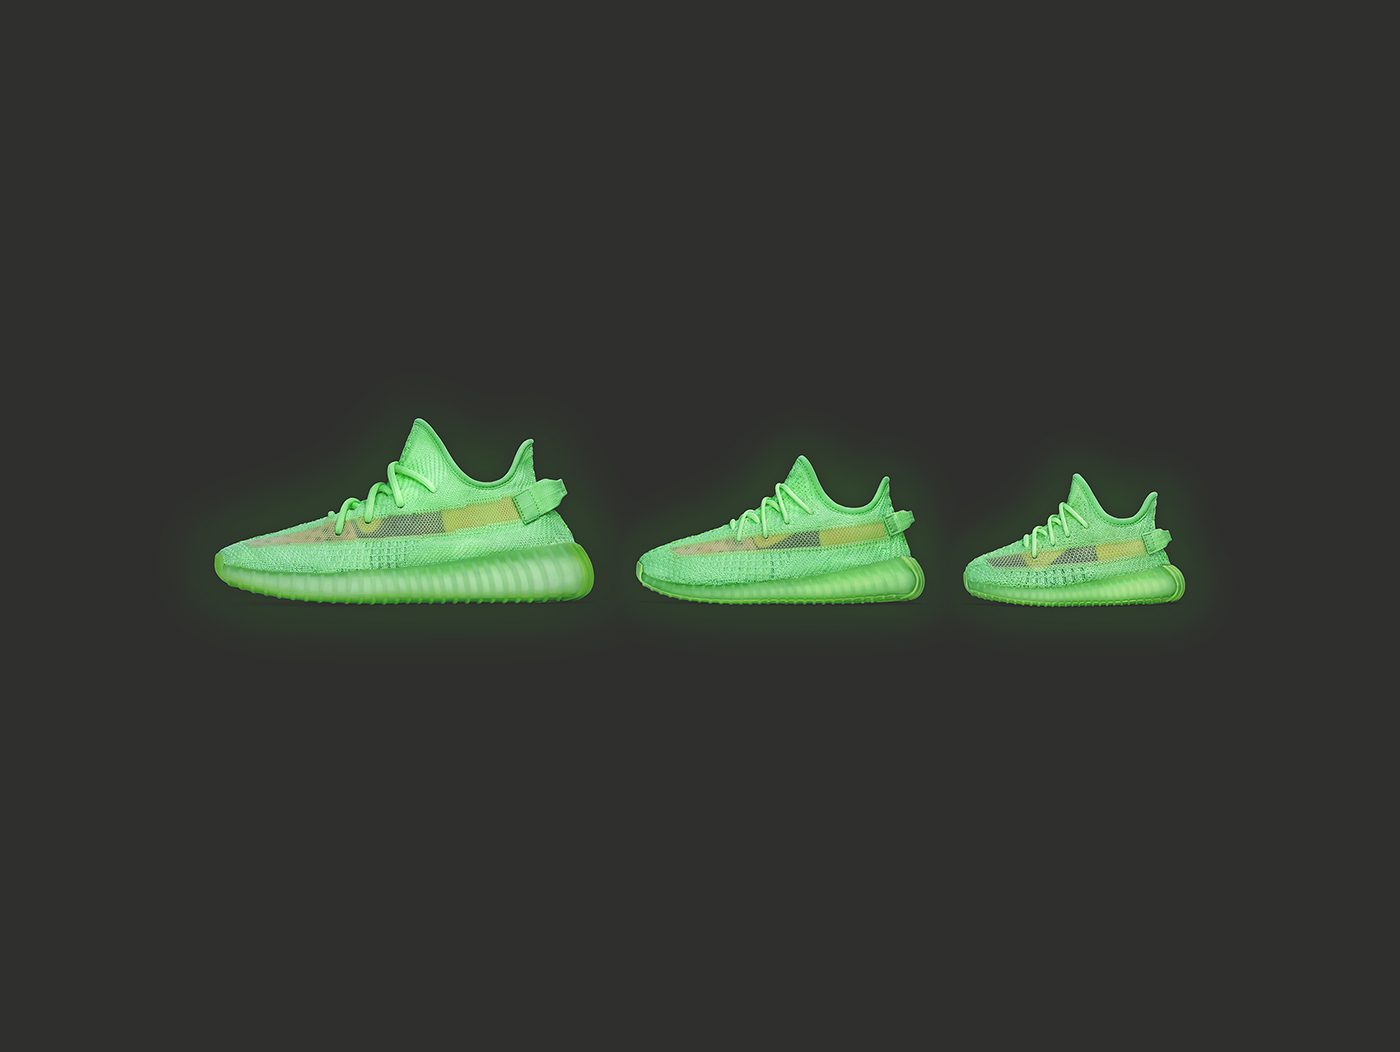 YEEZY BOOST 350 V2 Glow In The Dark